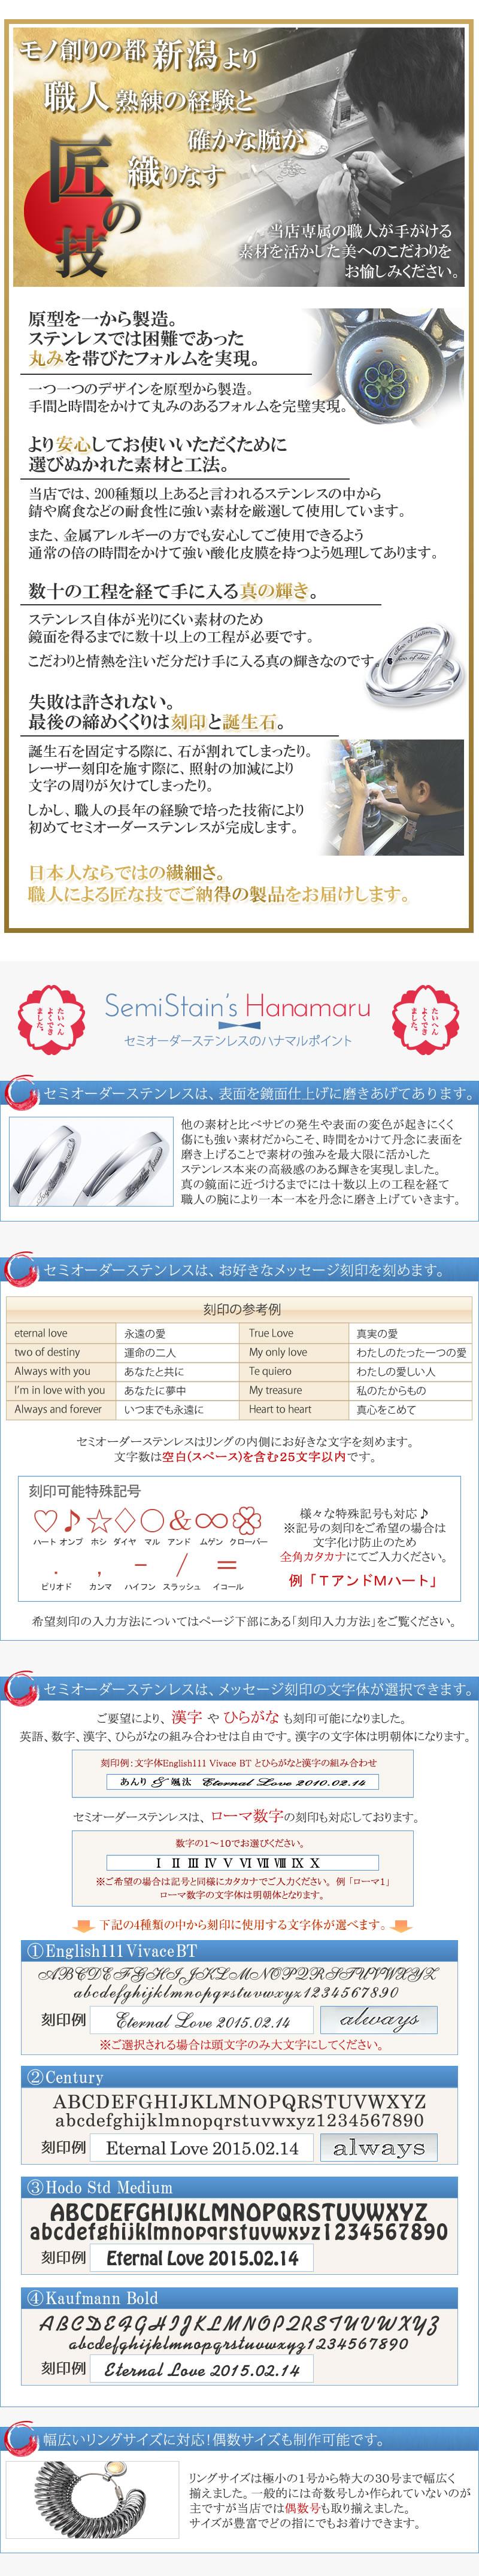 鏡面仕上げ 文字体選択 誕生石選択 1号〜30号まで対応